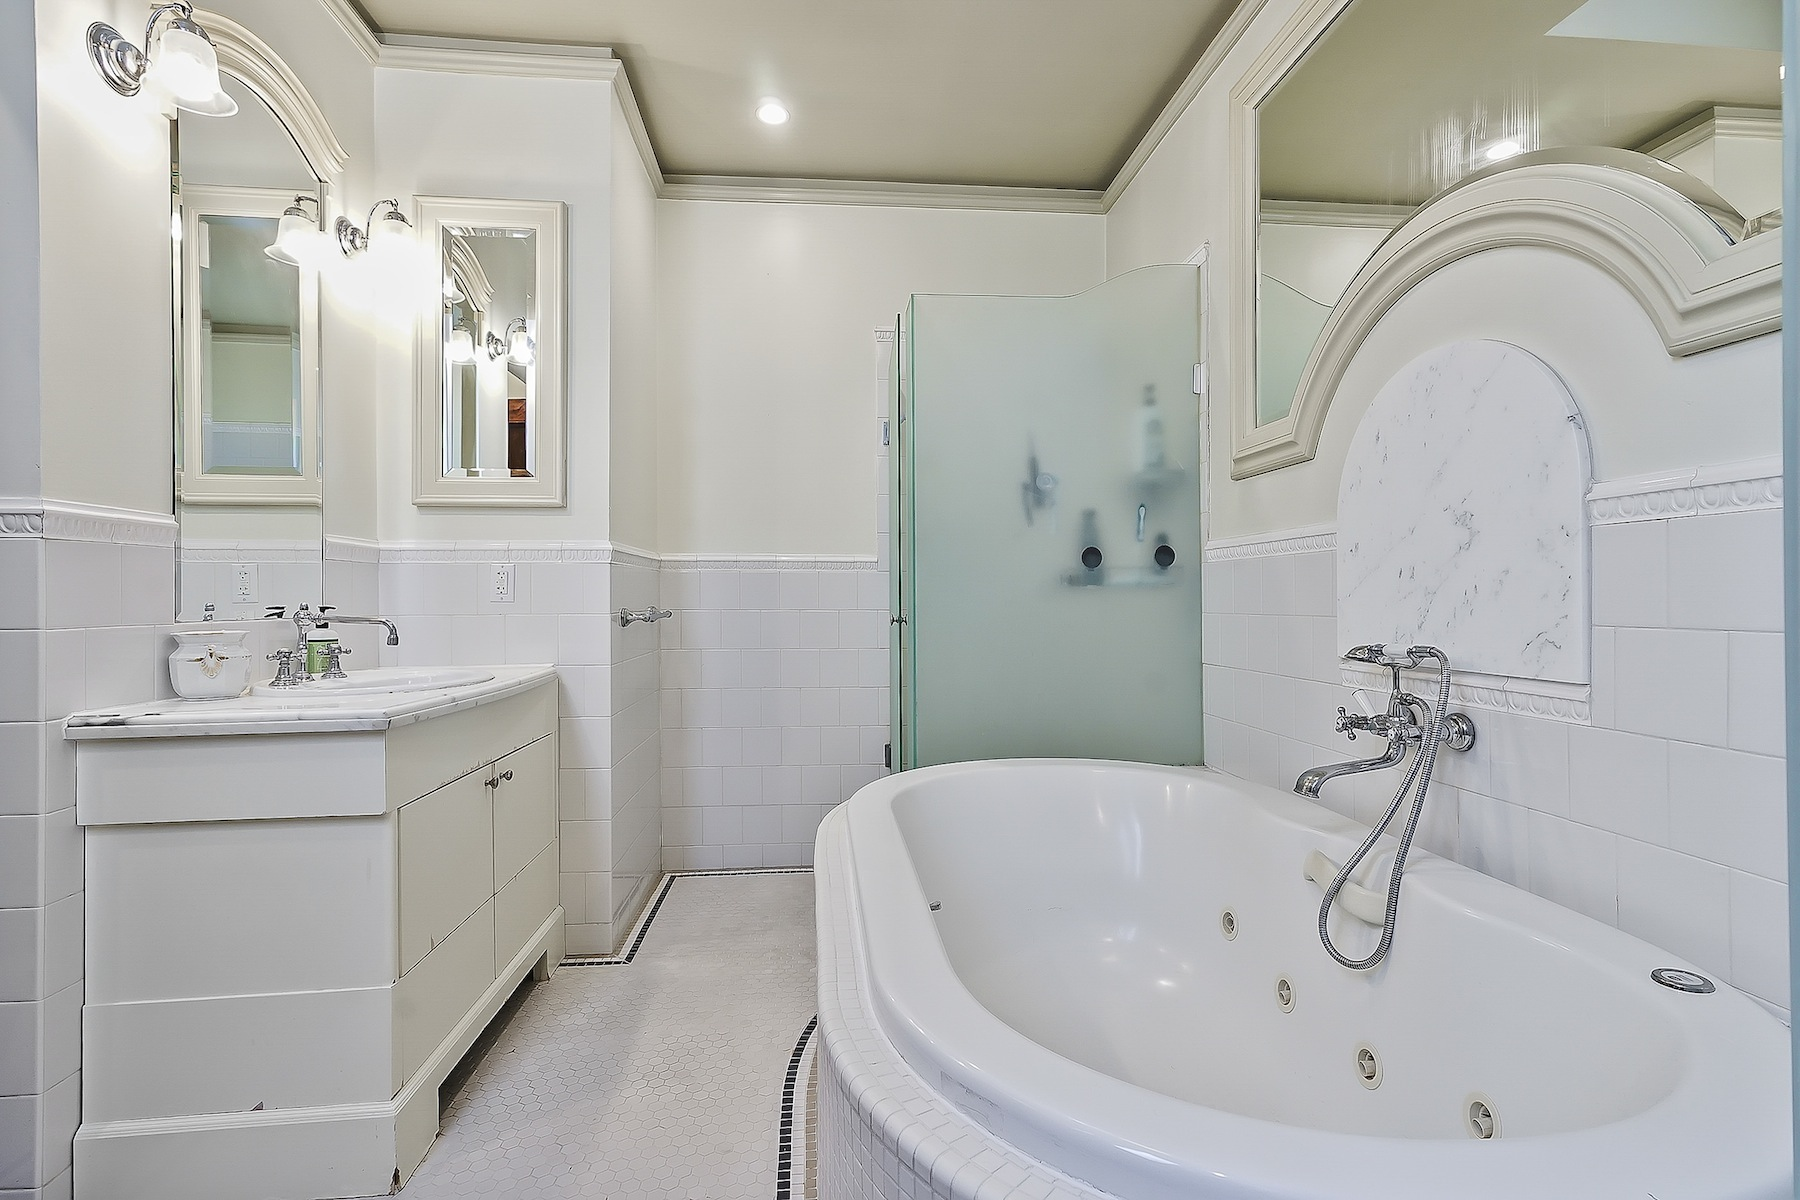 Additional photo for property listing at 524 Third Street 524 3rd street Brooklyn, Nueva York 11215 Estados Unidos